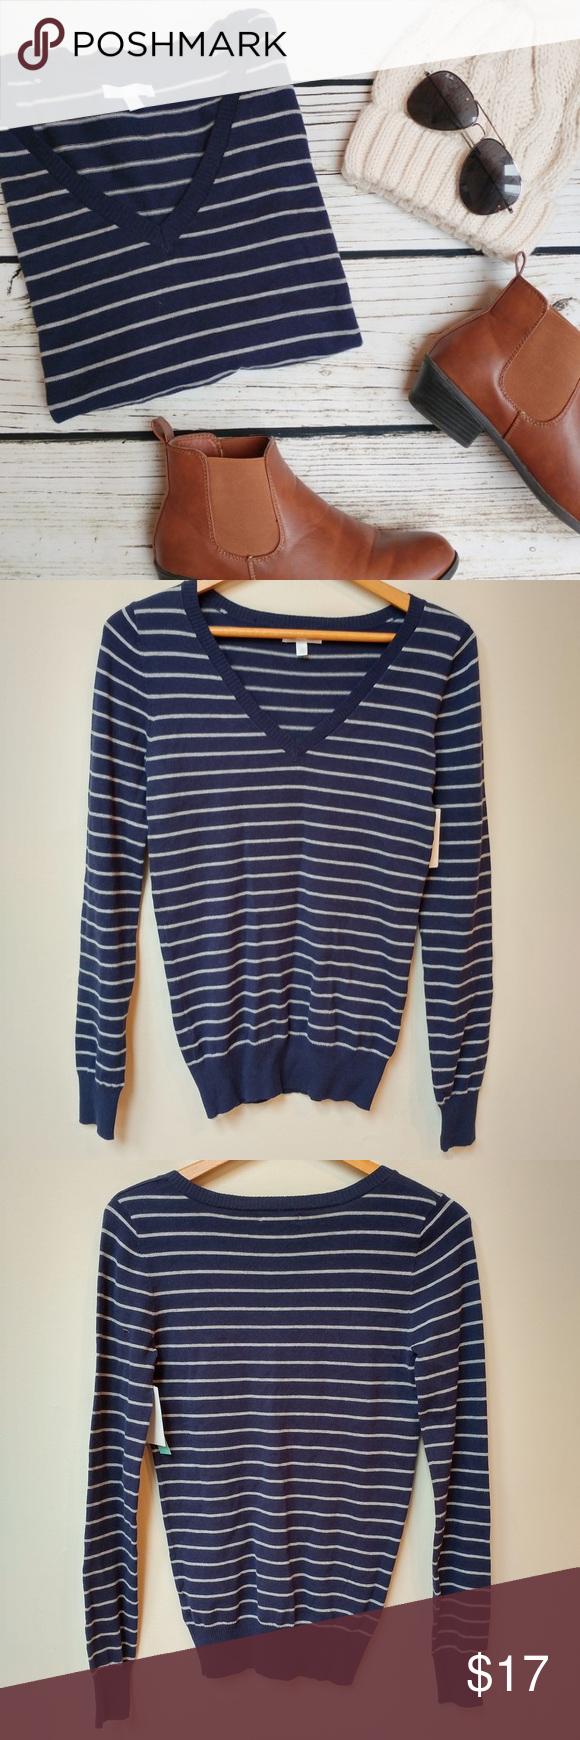 NWT Striped V-Neck Sweater Navy vile and gray striped v-neck ...